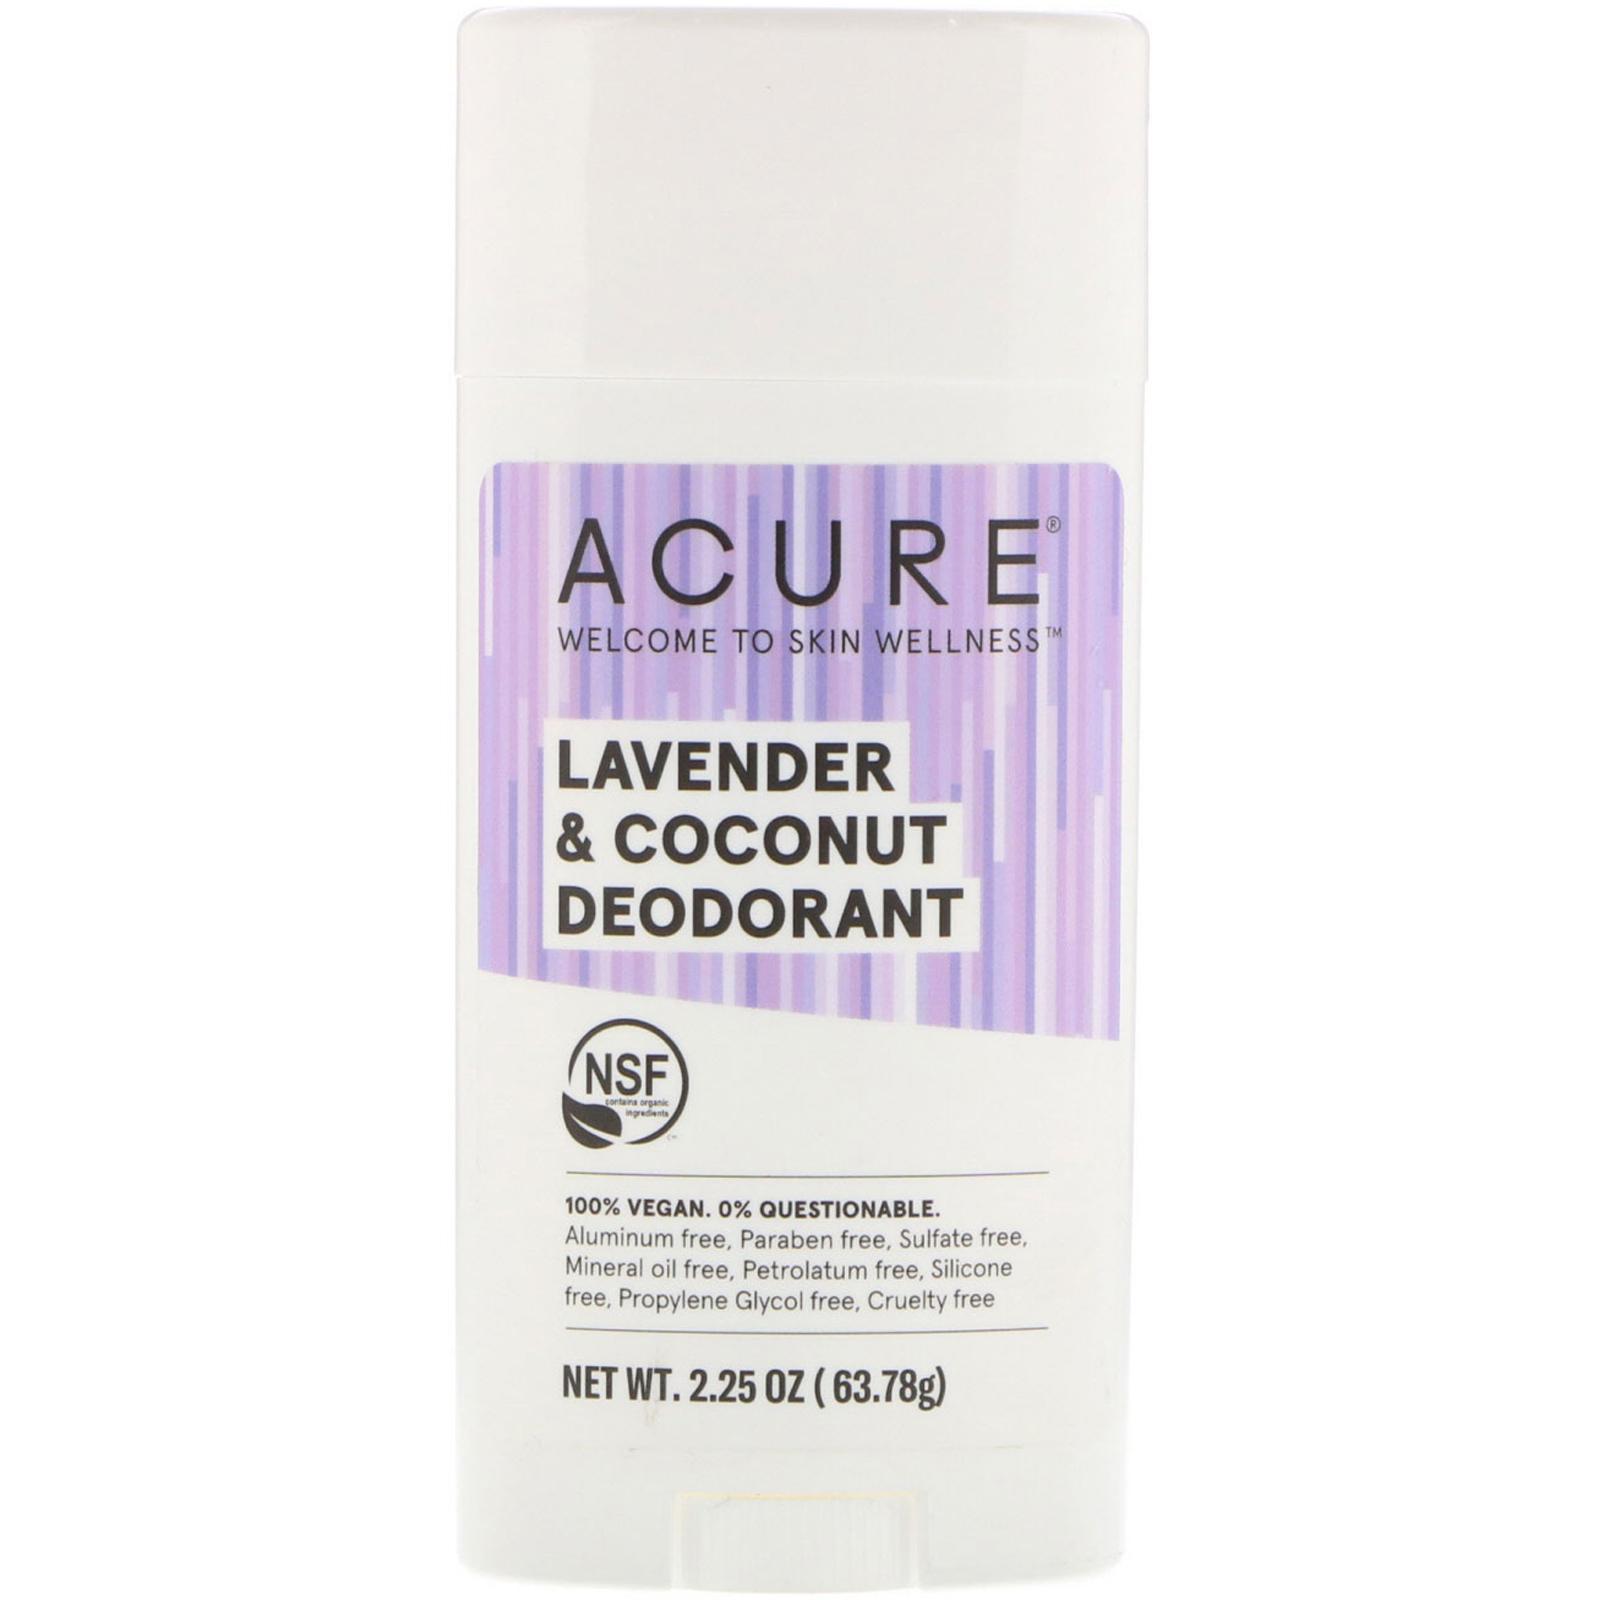 Acure Deodorant Lavender Coconut 2 25 Oz 63 78 G